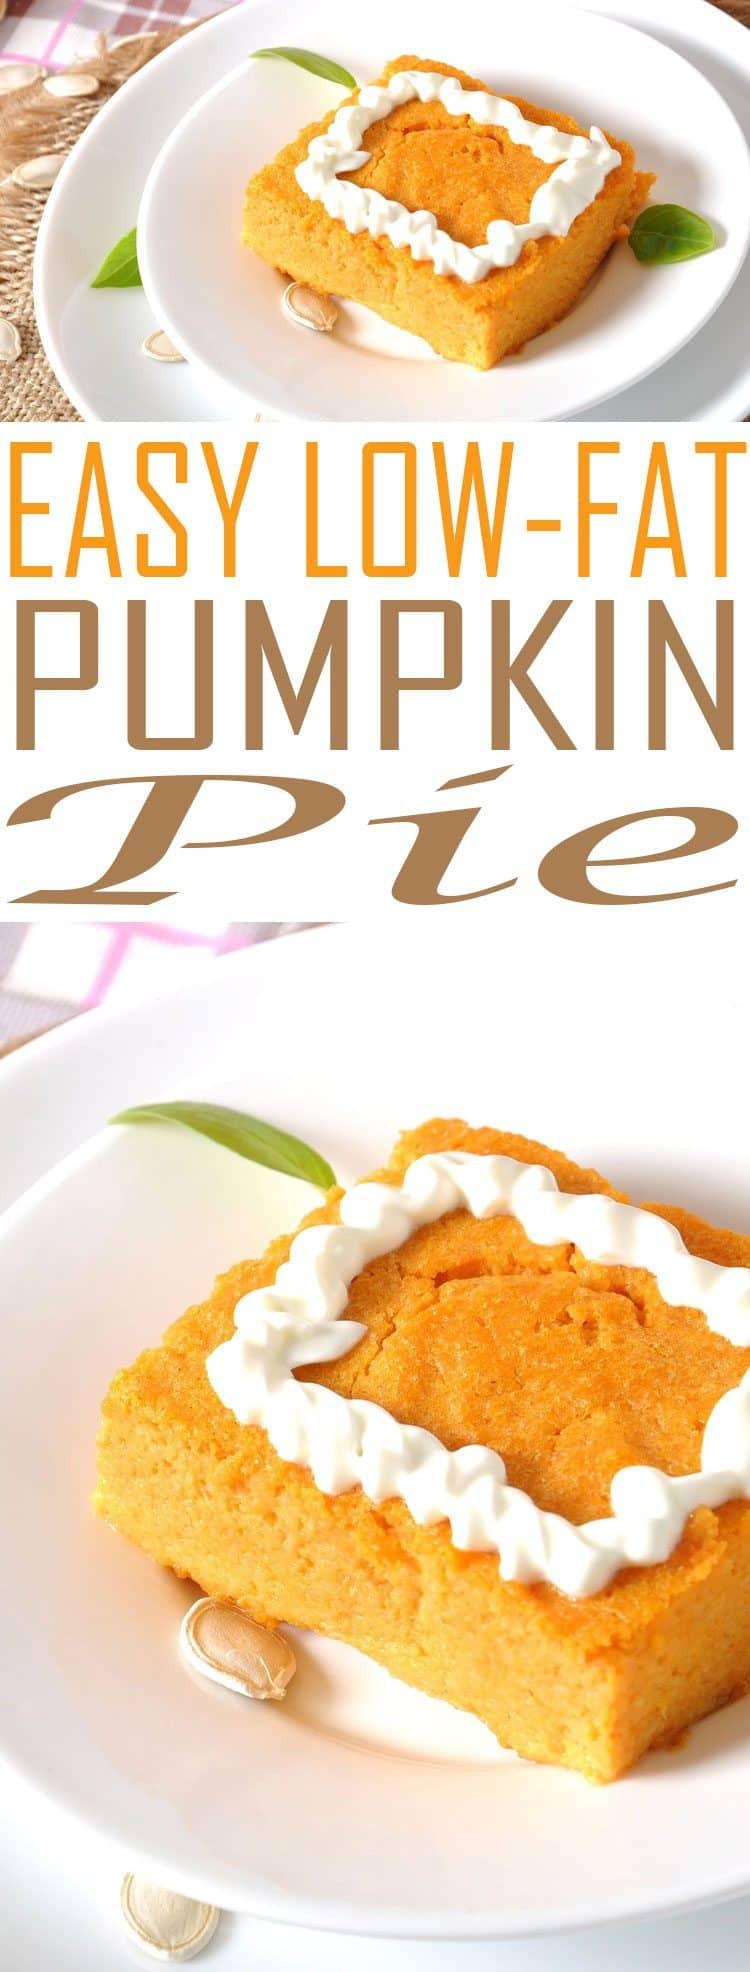 Easy Low Fat Recipes  Weight Watchers Pumpkin Pie Just 1 4 Smart Points Per